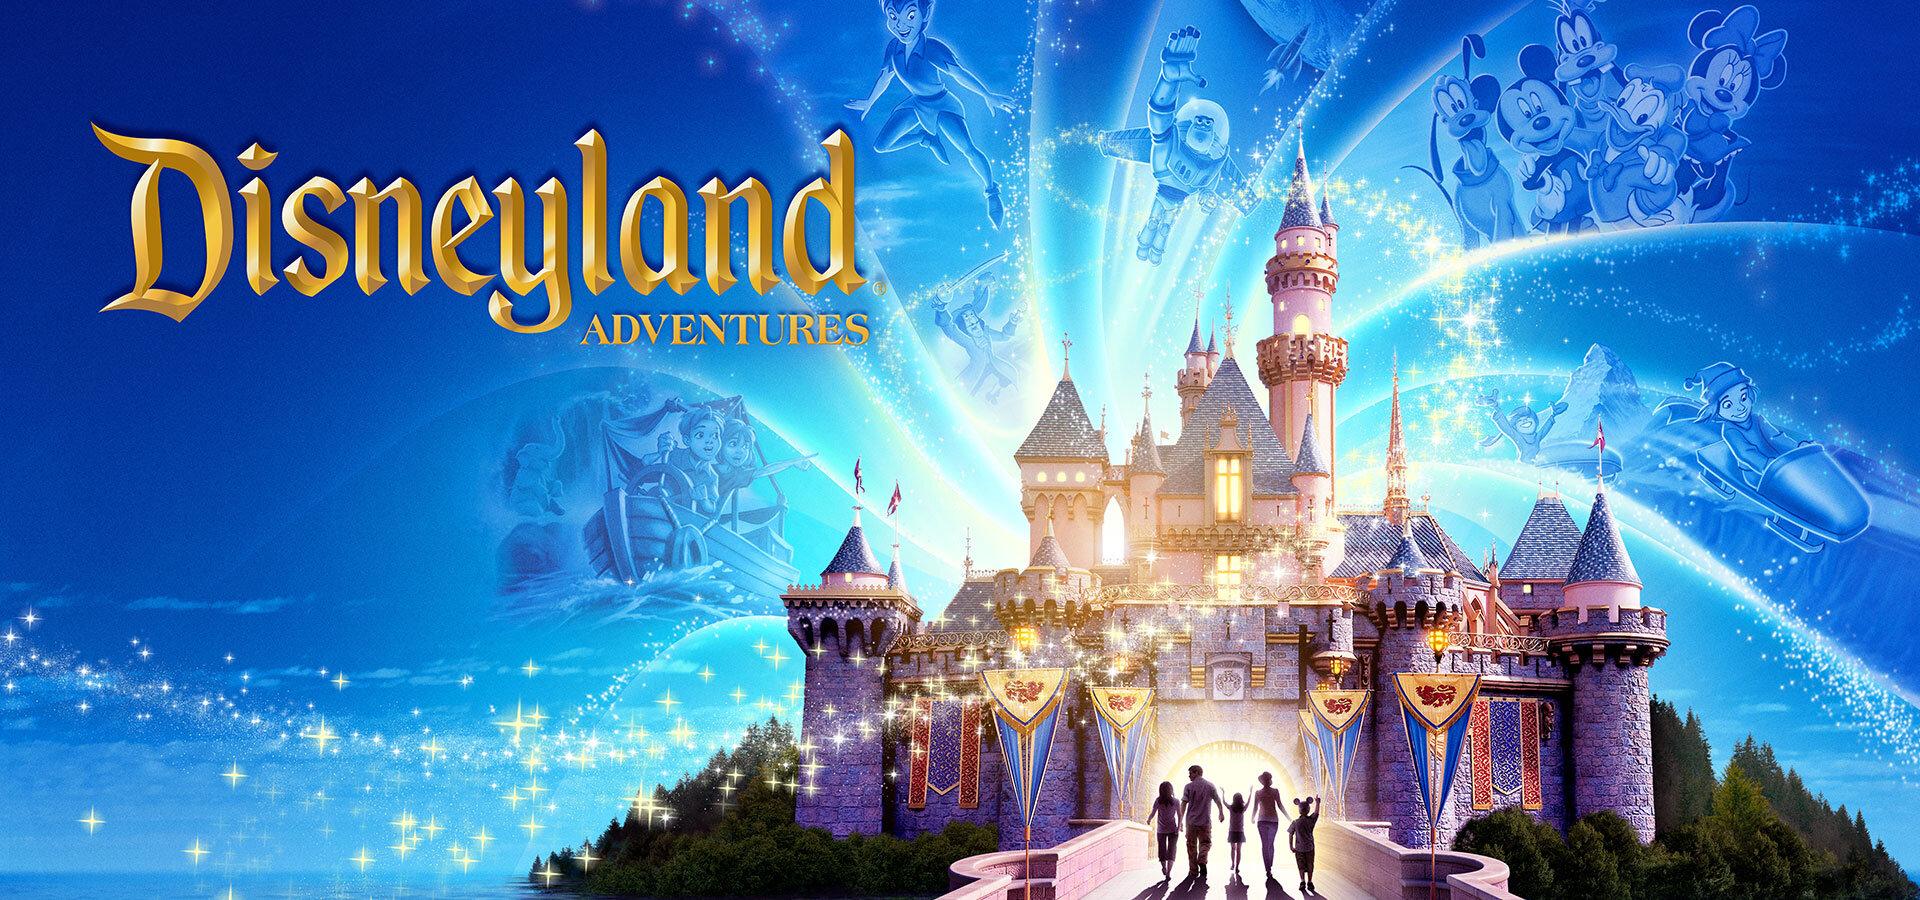 KINECT DISNEYLAND ADVENTURES:  AAA VIDEO GAME    Music Editor   Disney - Pyramind - Skywalker Sound